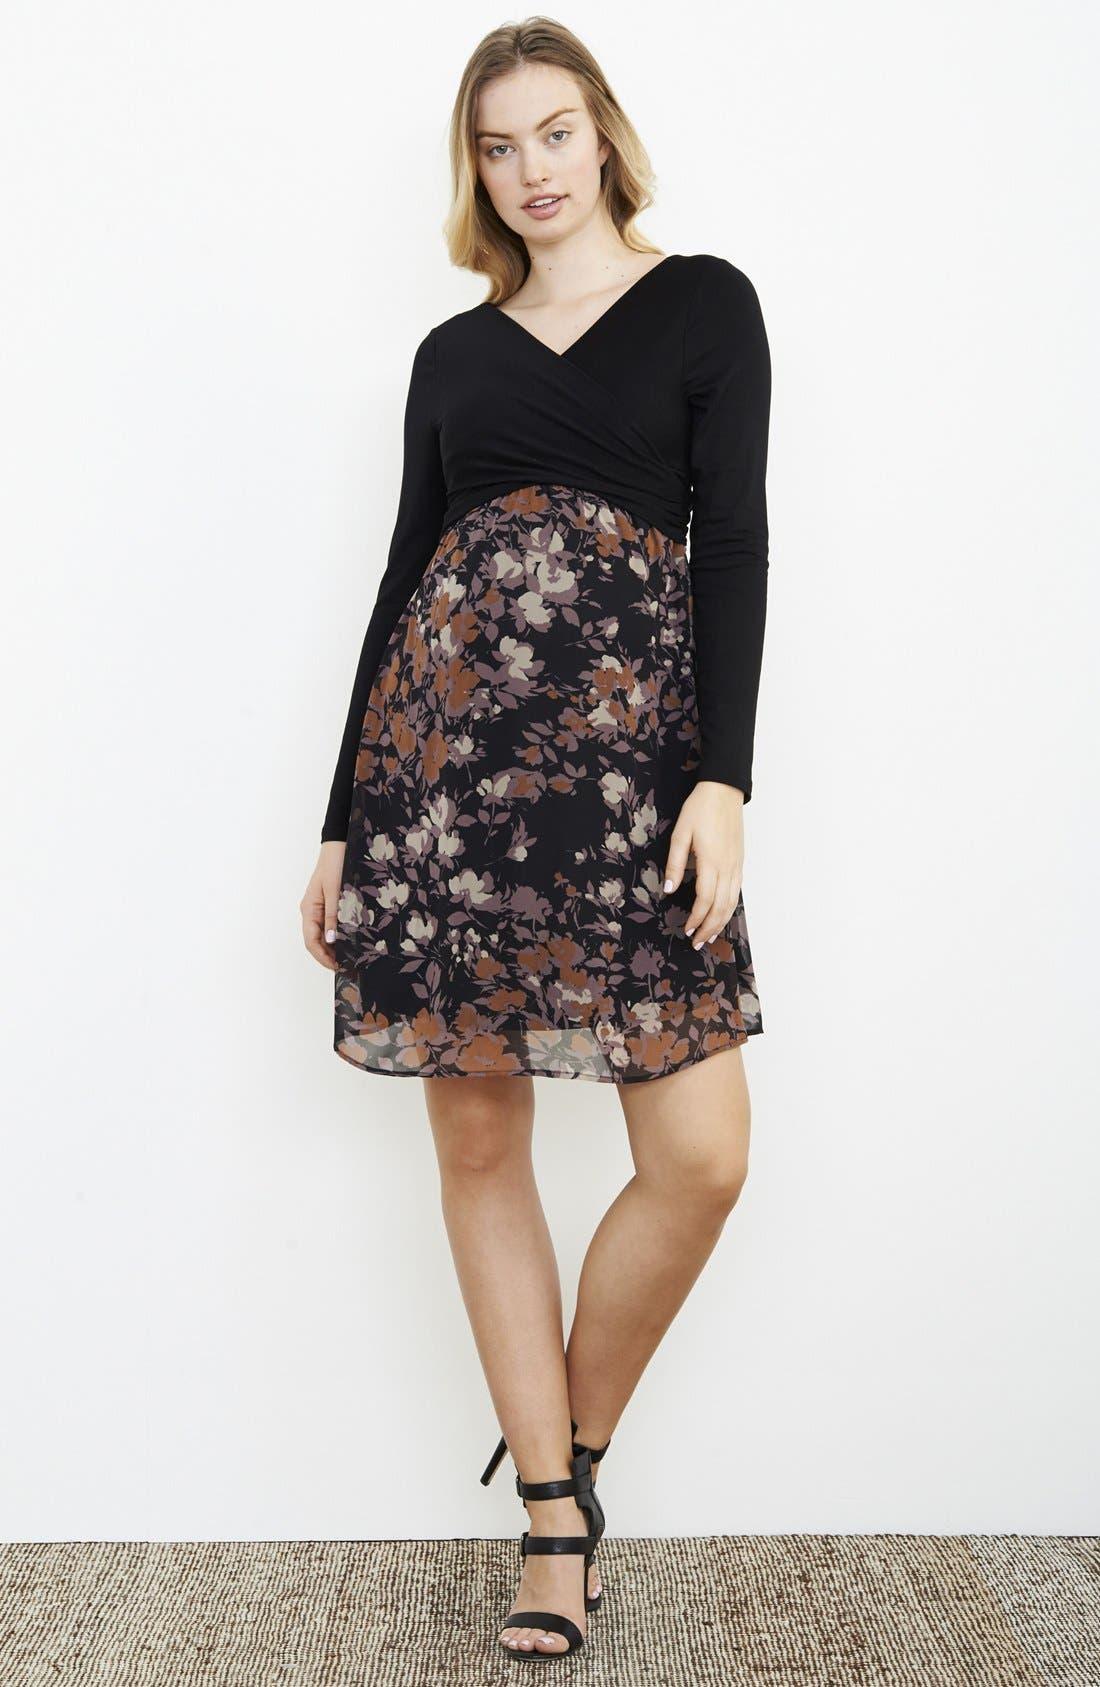 Crossover Maternity Dress,                             Main thumbnail 1, color,                             BLACK/ LILAC FLORAL PRINT